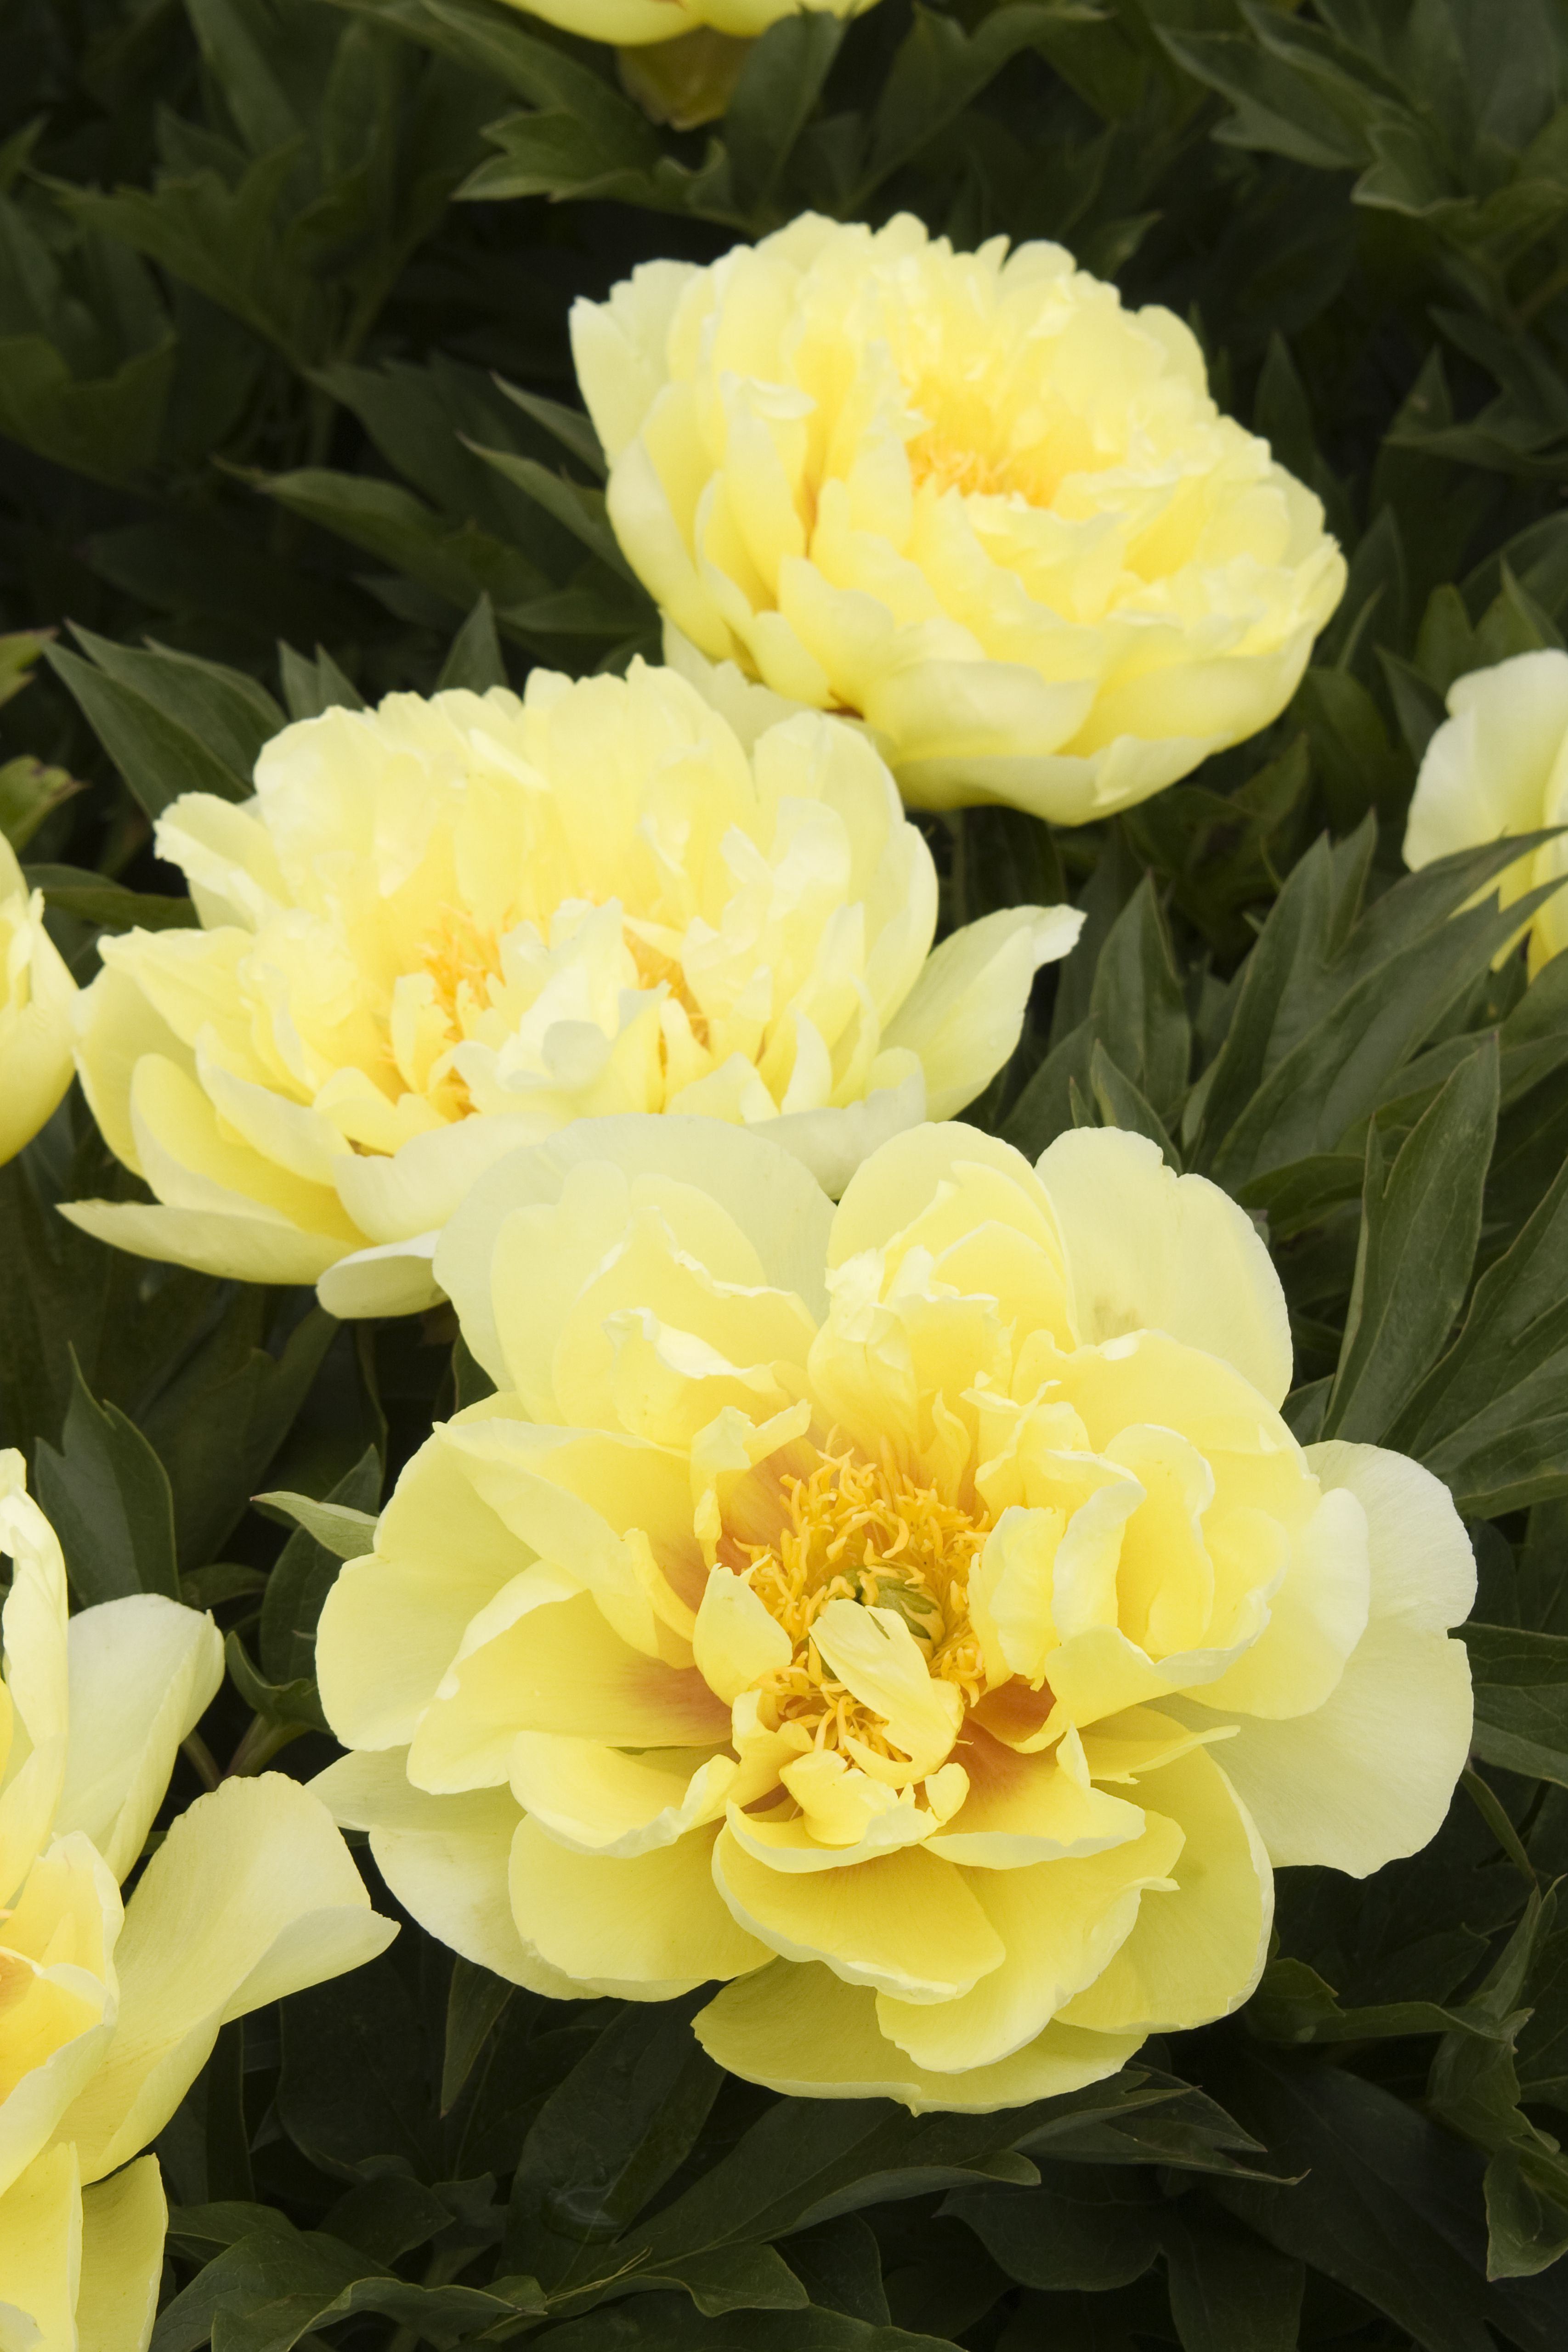 Bartzella Itoh Peony Has Very Large Bright Yellow Double Blossoms